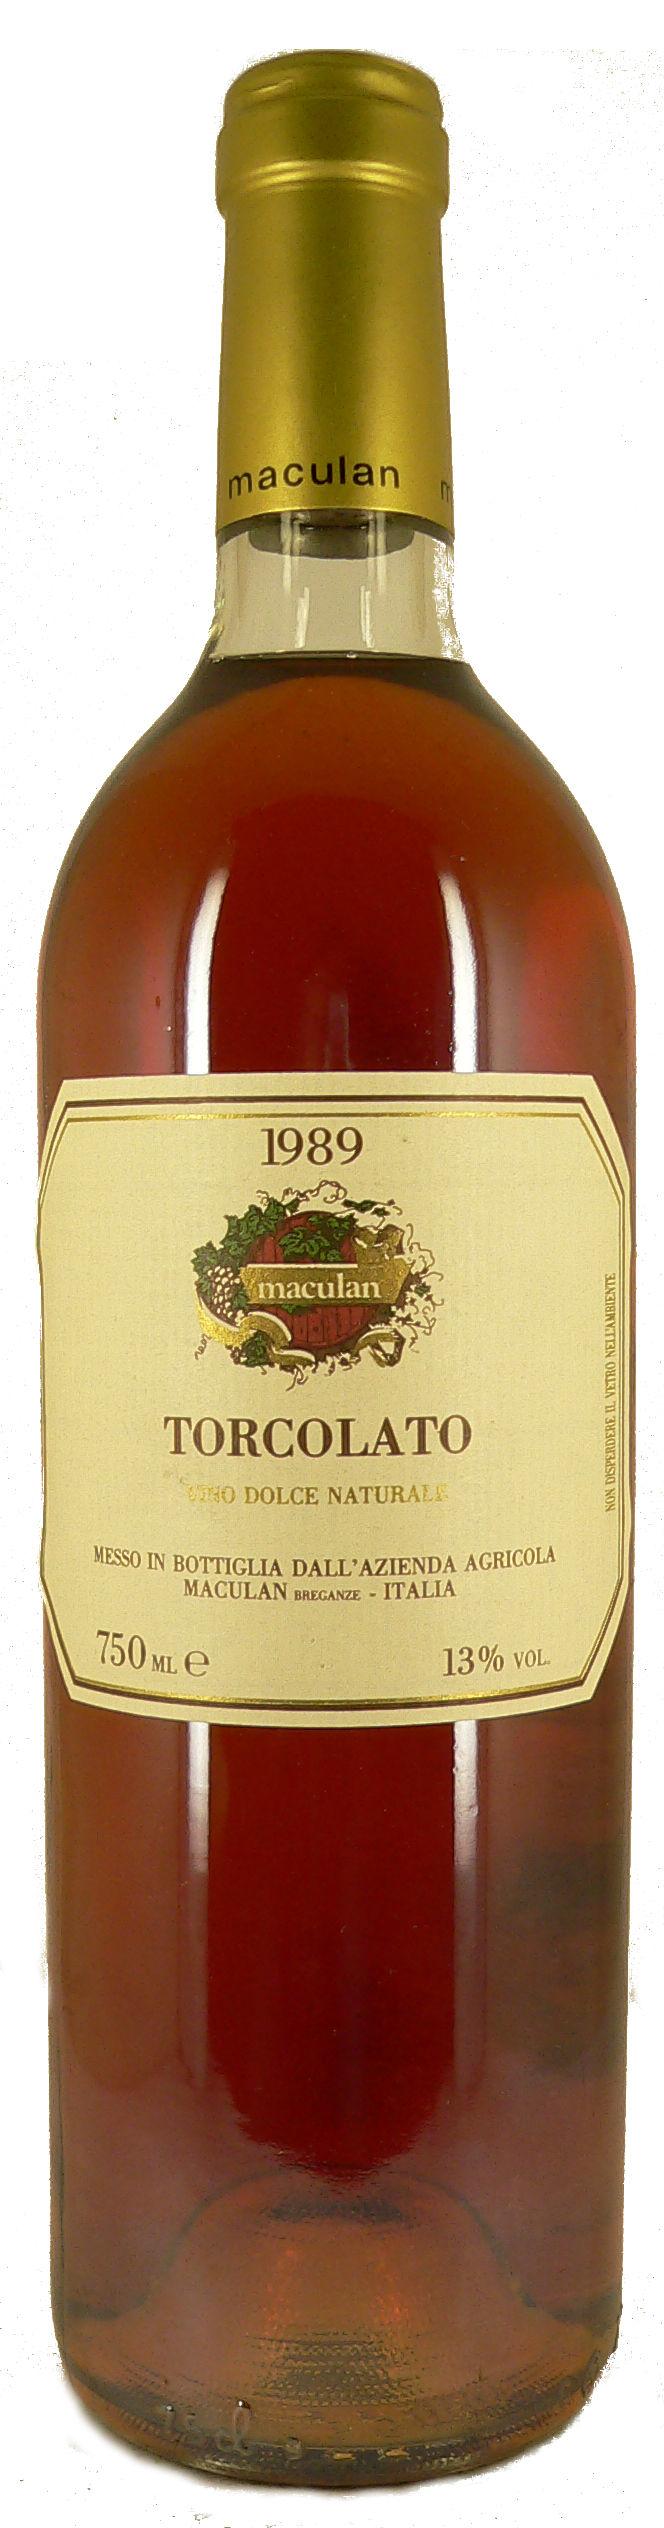 1989 Torcolato dolce